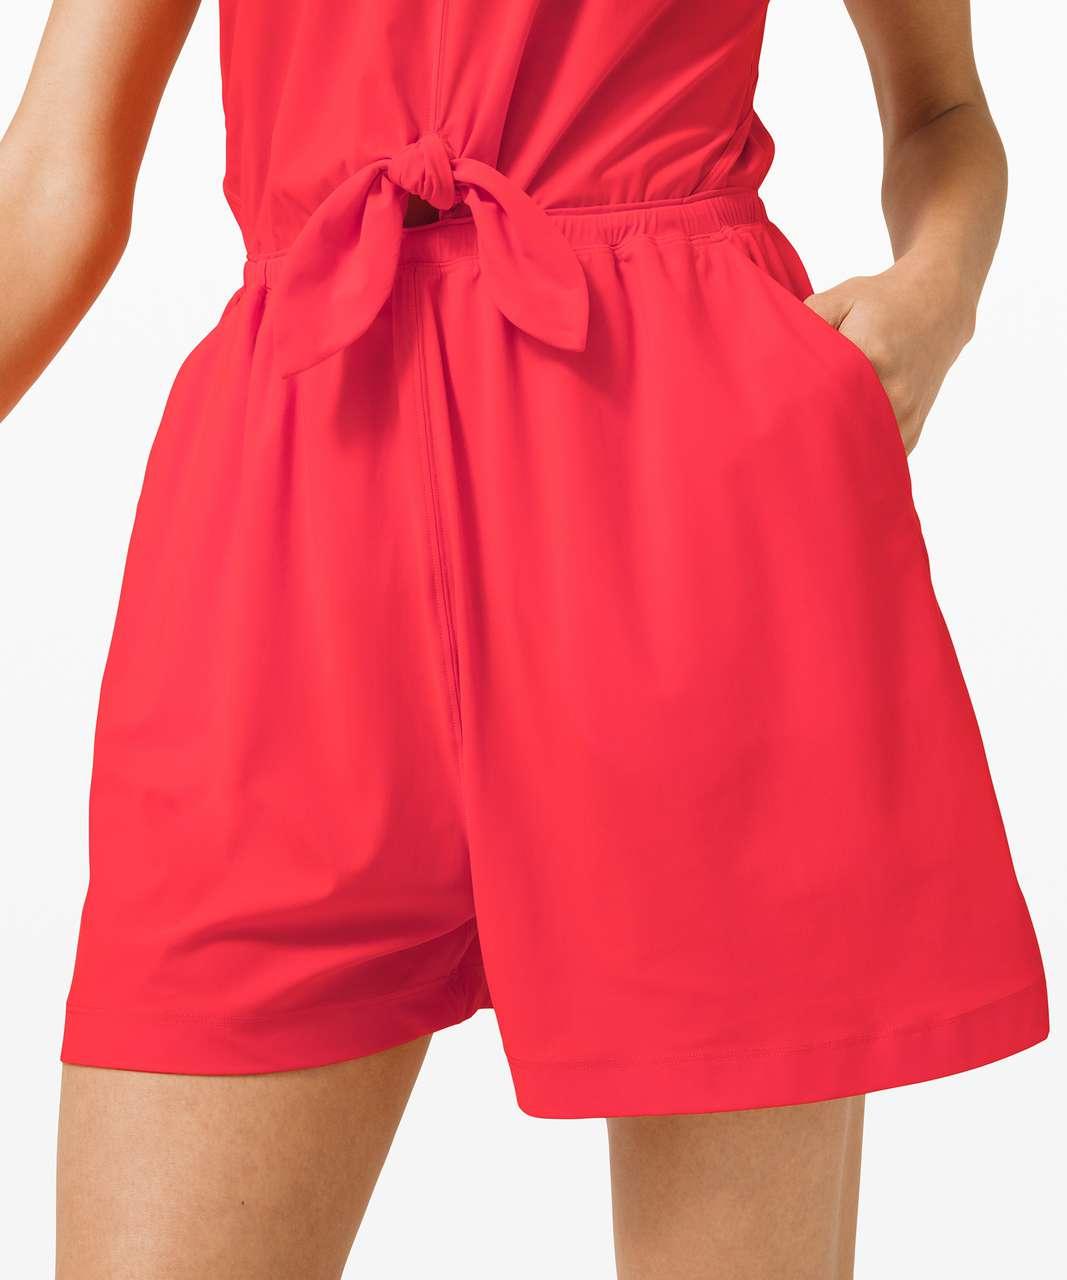 Lululemon Handle the Heat Romper - Carnation Red